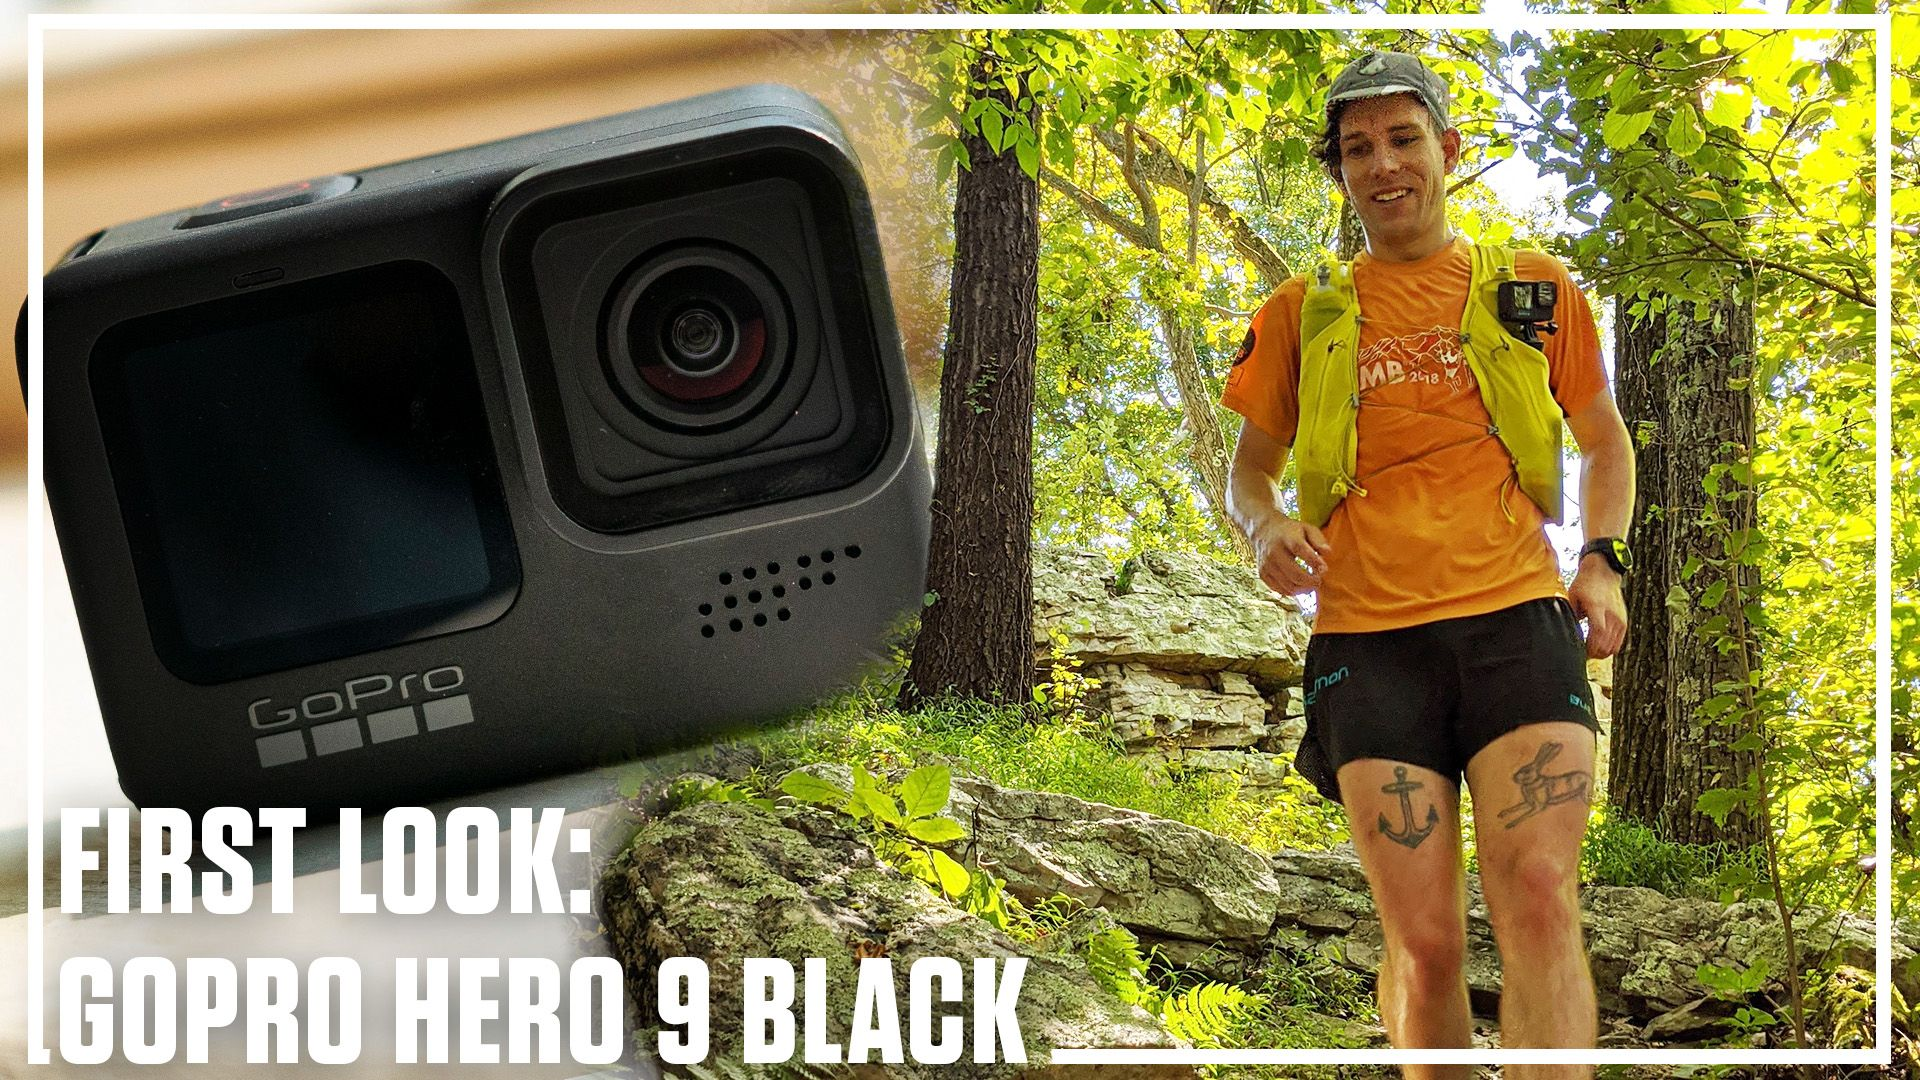 First Look: GoPro Hero 9 Black | Runner's World